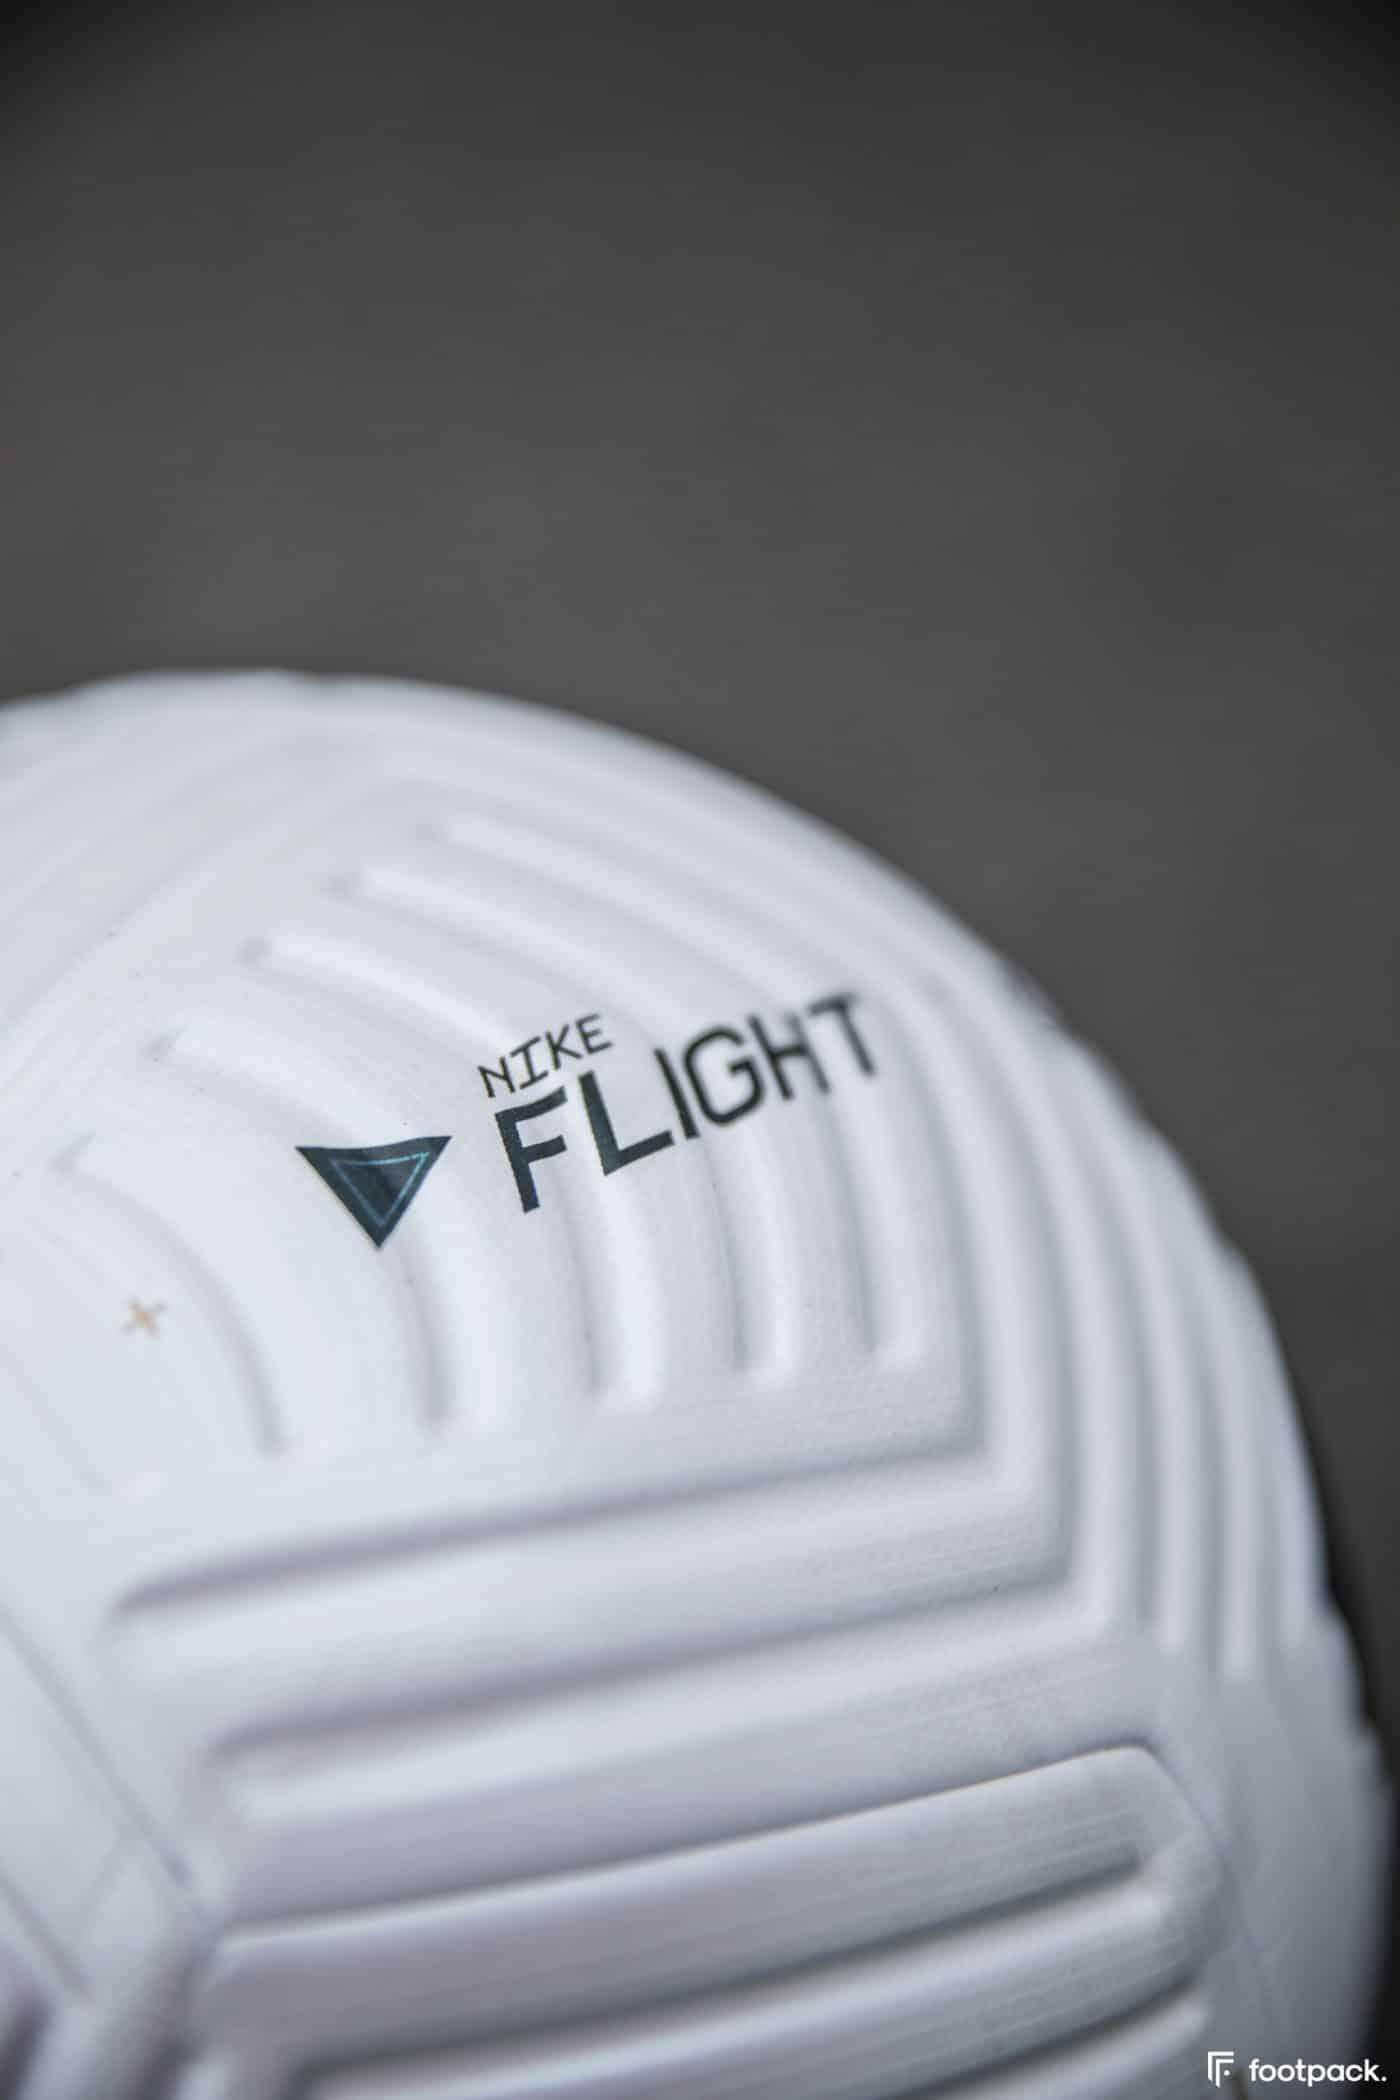 ballon-nike-flight-premier-league-serie-a-footpack-12